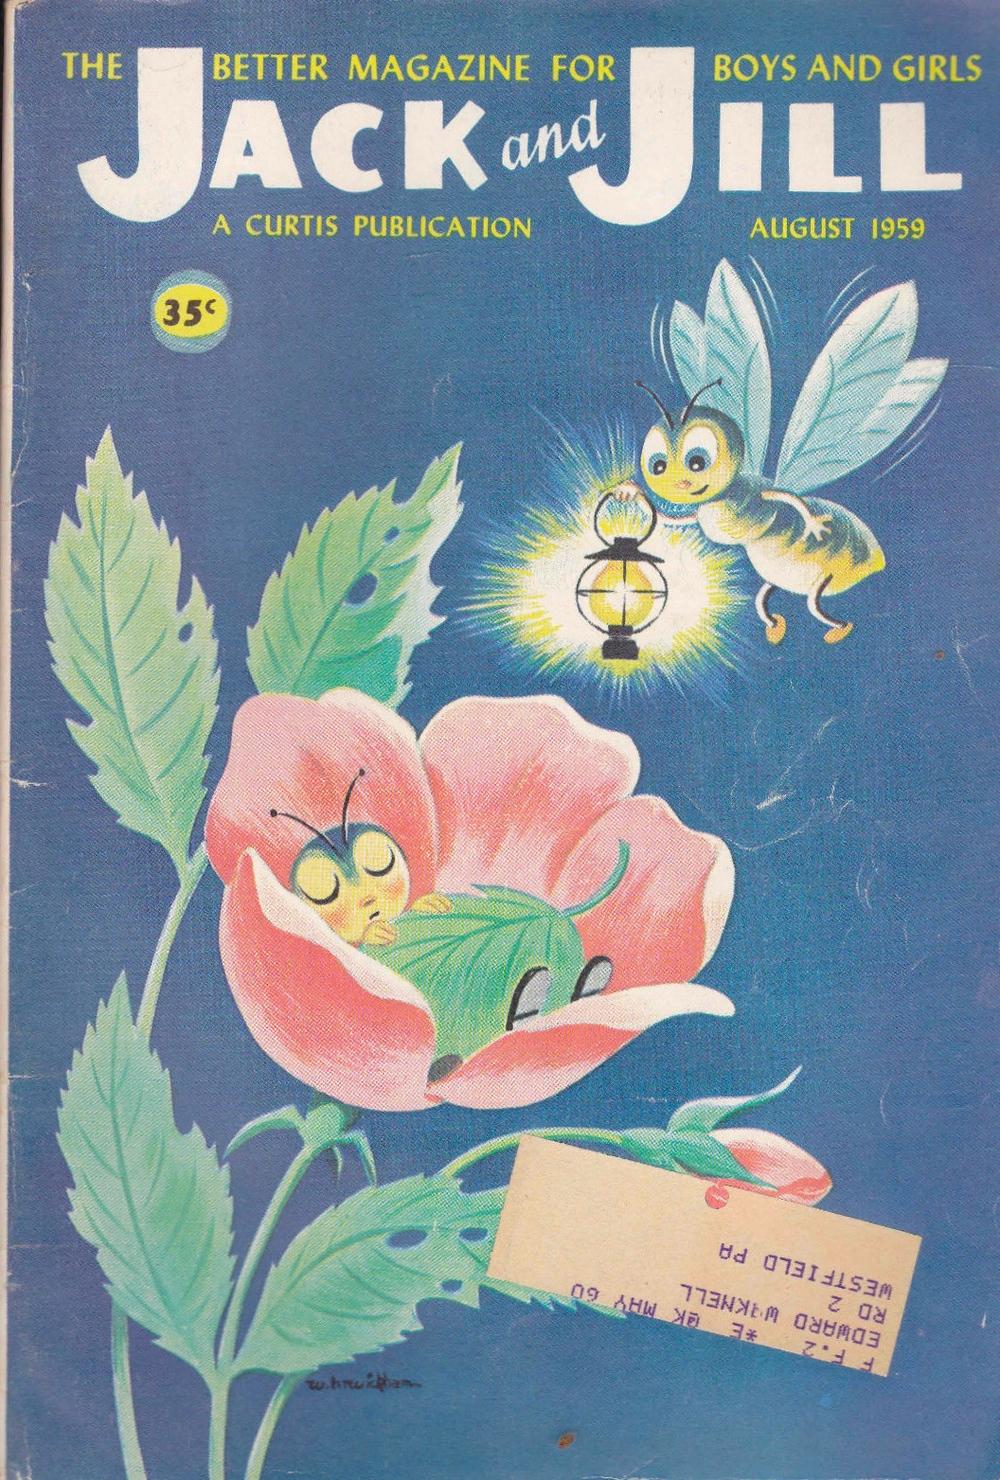 August 1959, Wilbur Wickham via ebay